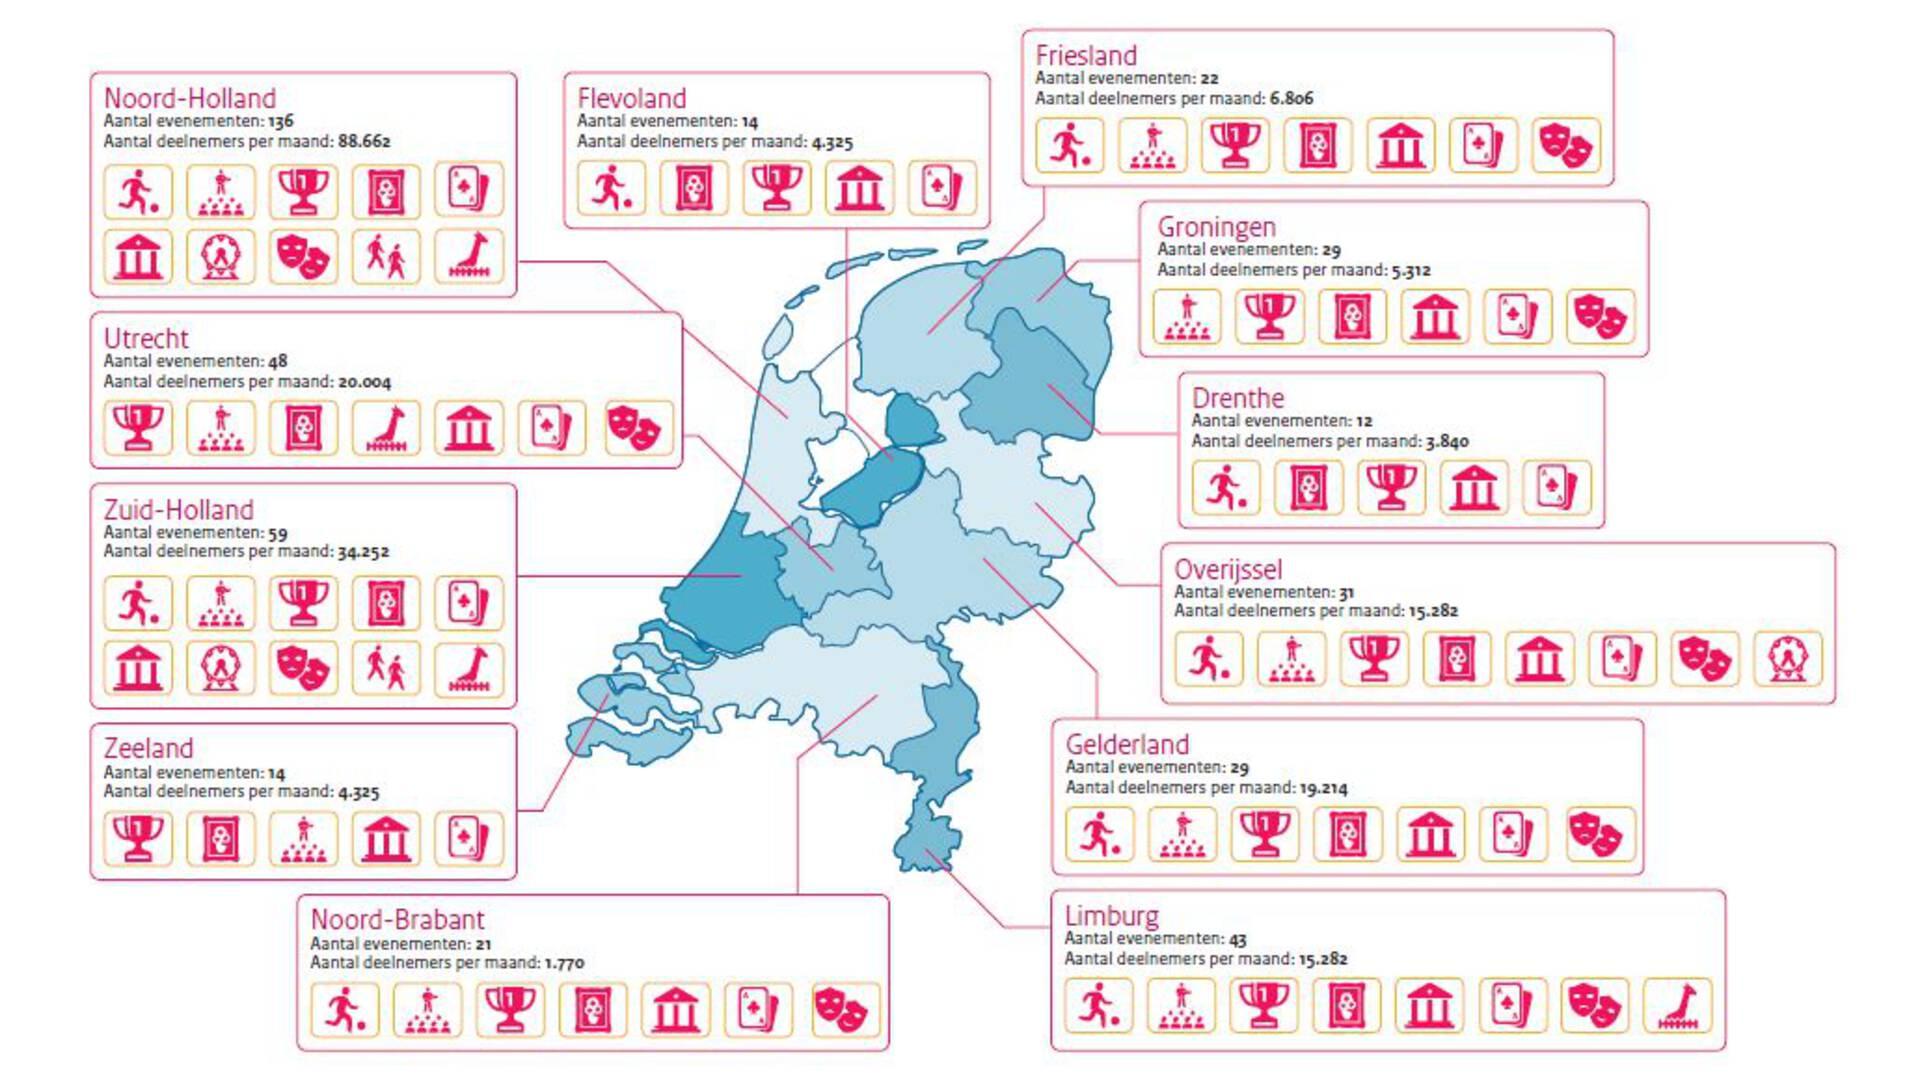 https://cdn.nos.nl/image/2021/04/06/730556/1920x1080a.jpg